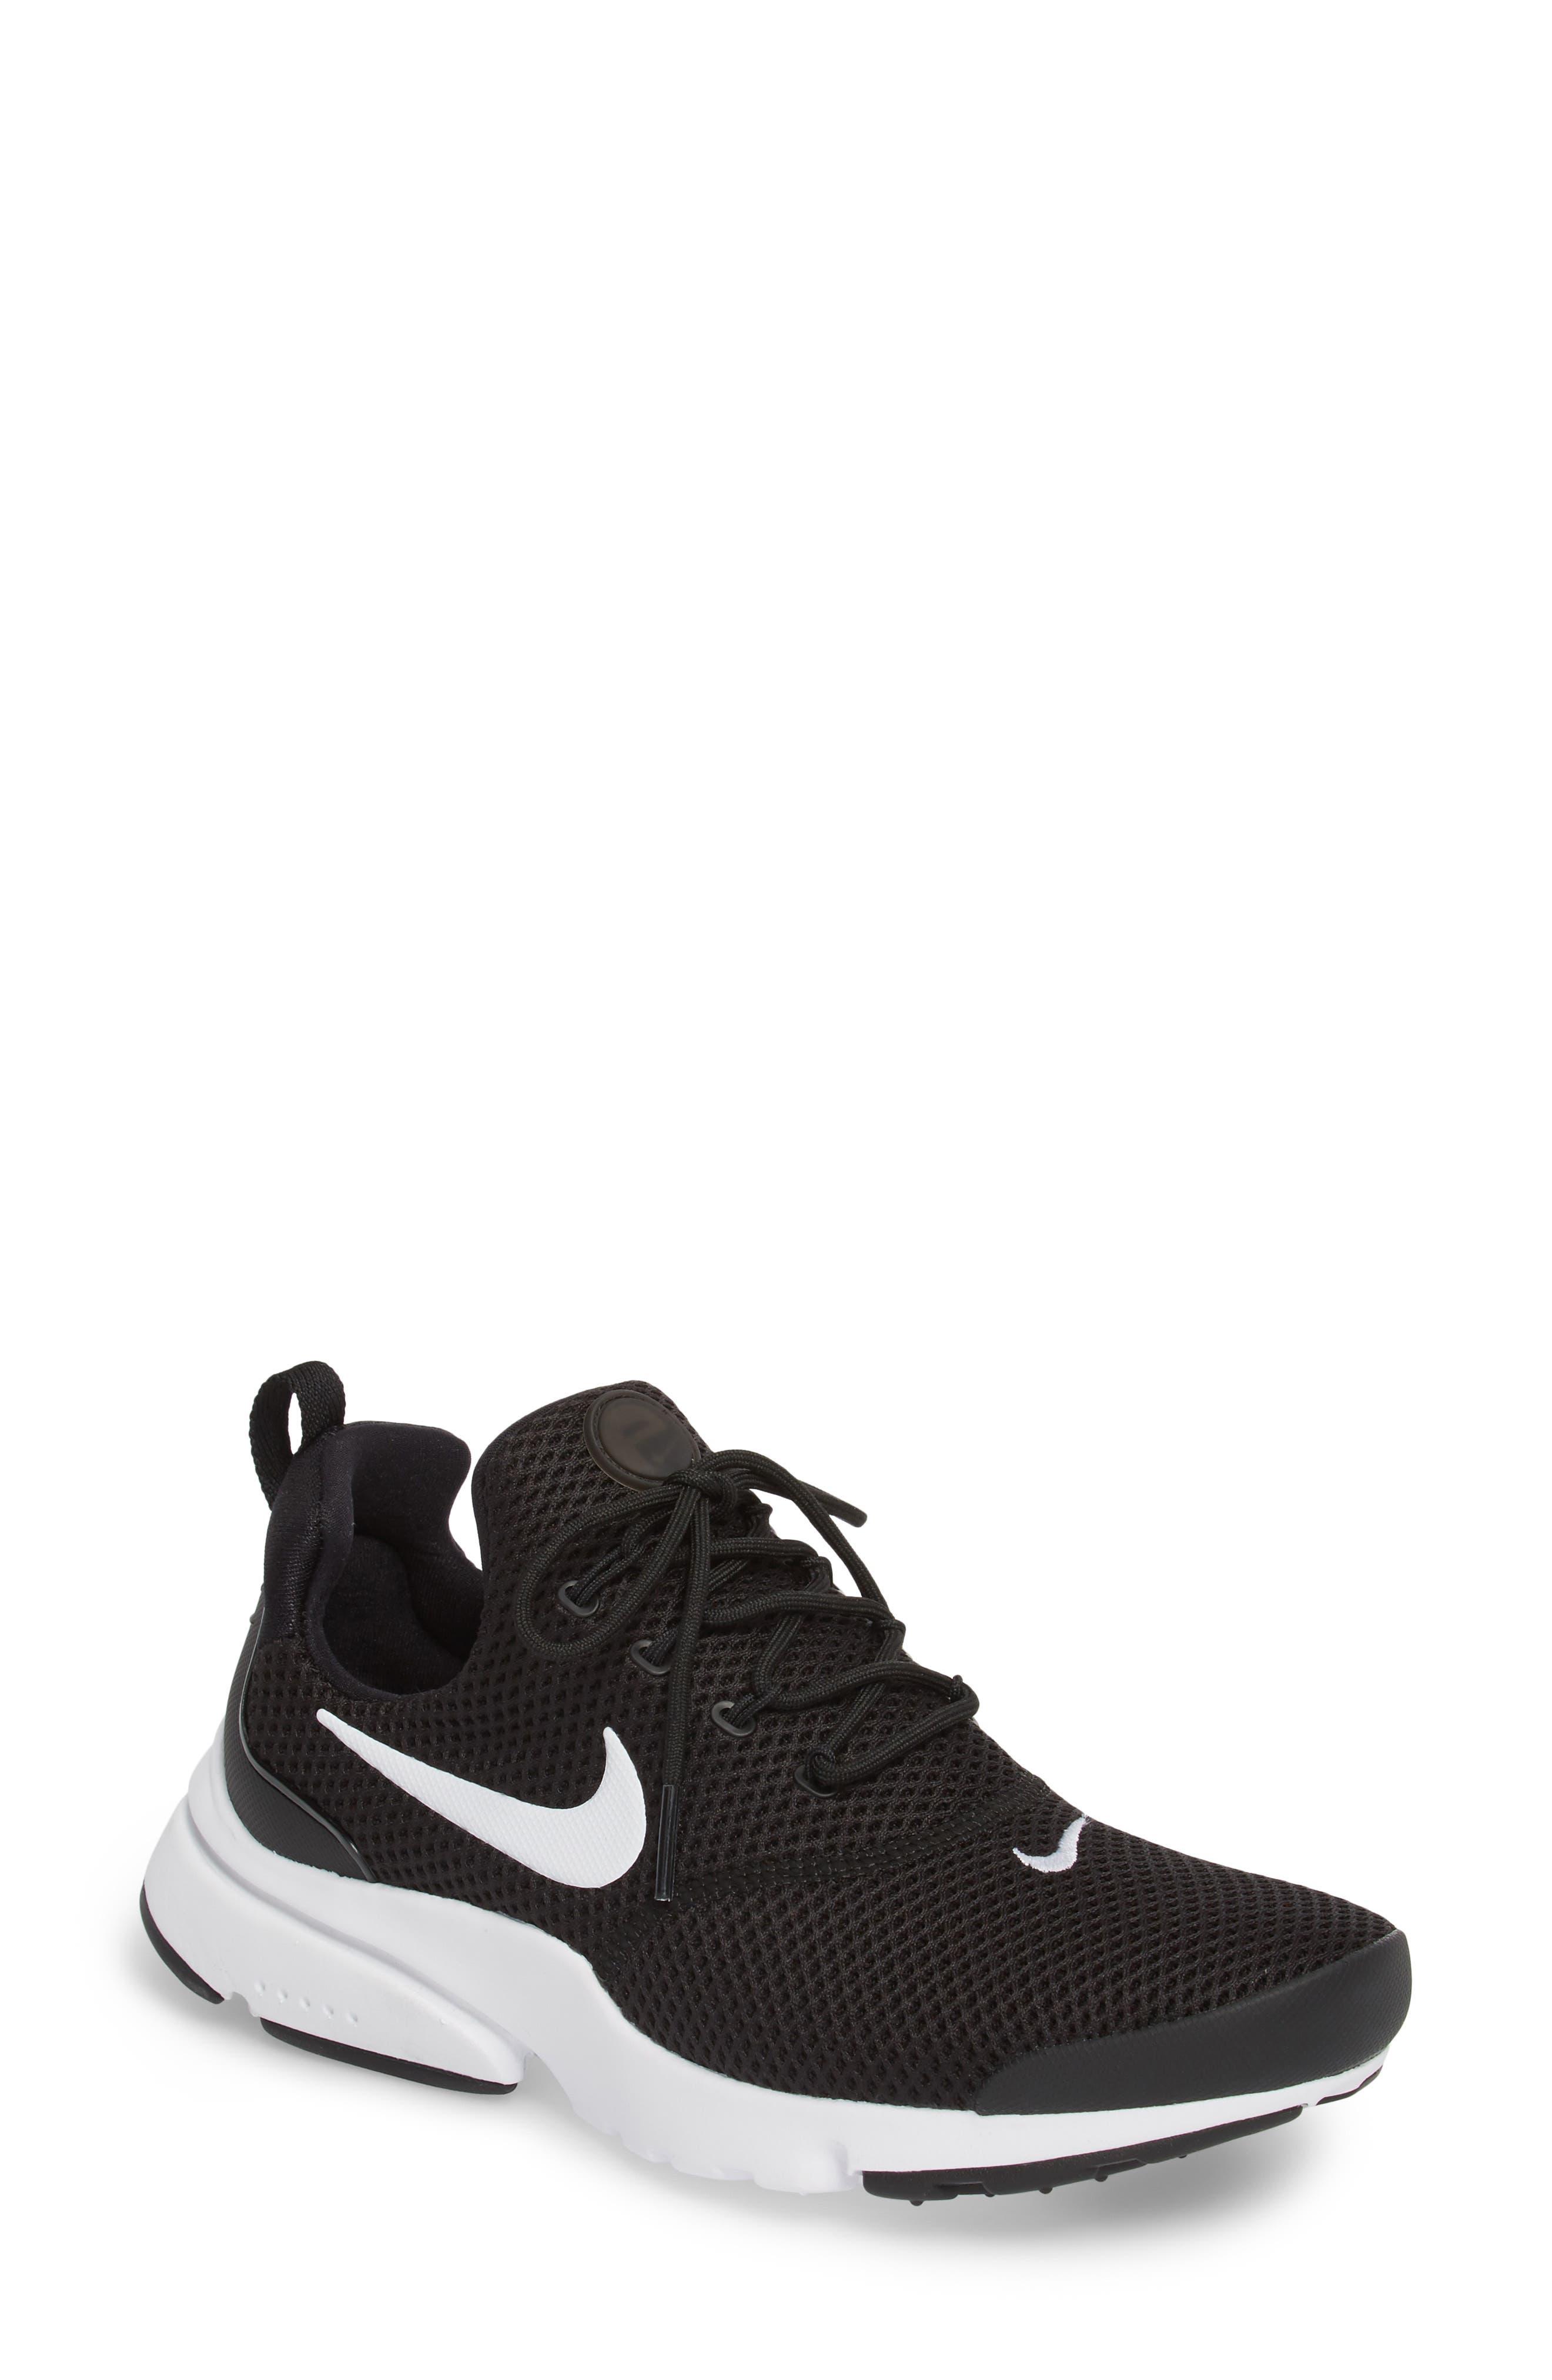 Presto Fly Sneaker,                             Main thumbnail 1, color,                             Black/ White/ White